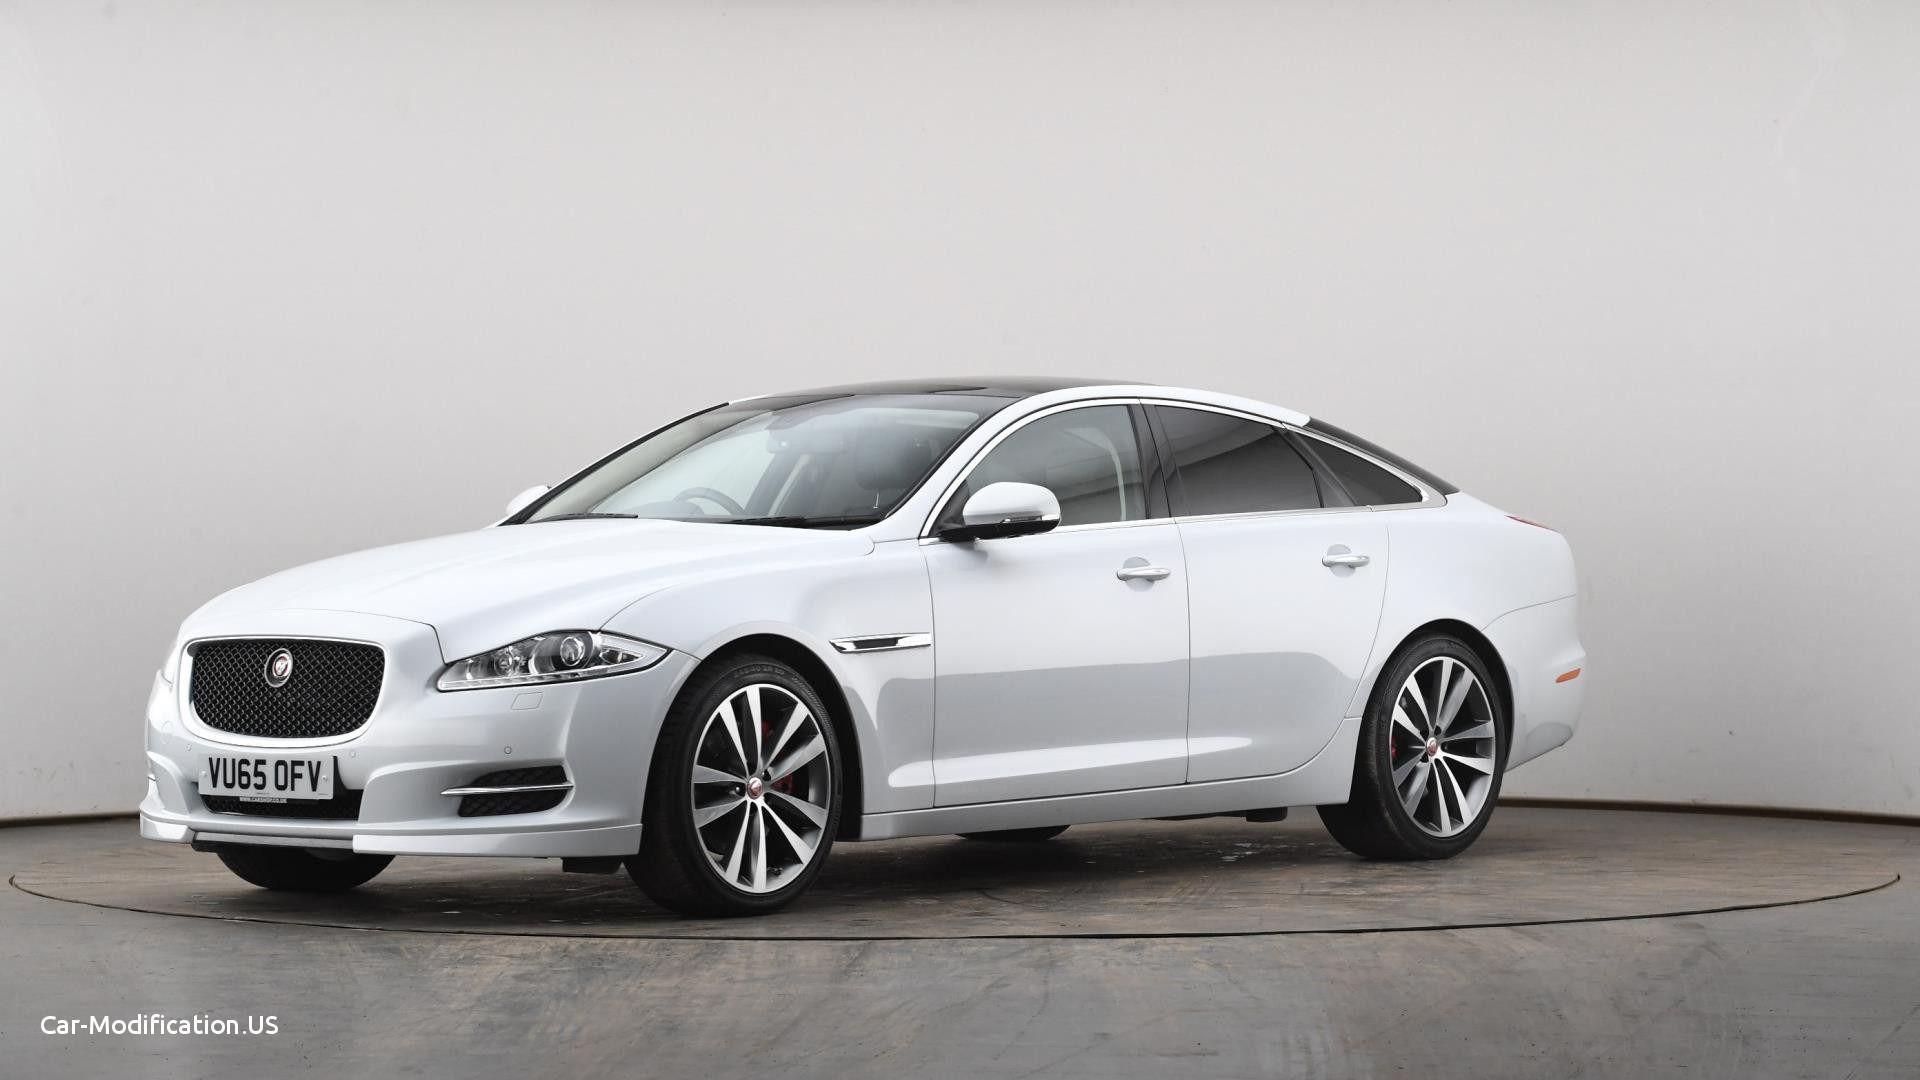 2020 Jaguar Xe Inspirational 2019 Jaguar Xj Coupe 2019 Jaguar Xj Top Used Suv Car Dealership Luxury Car Garage